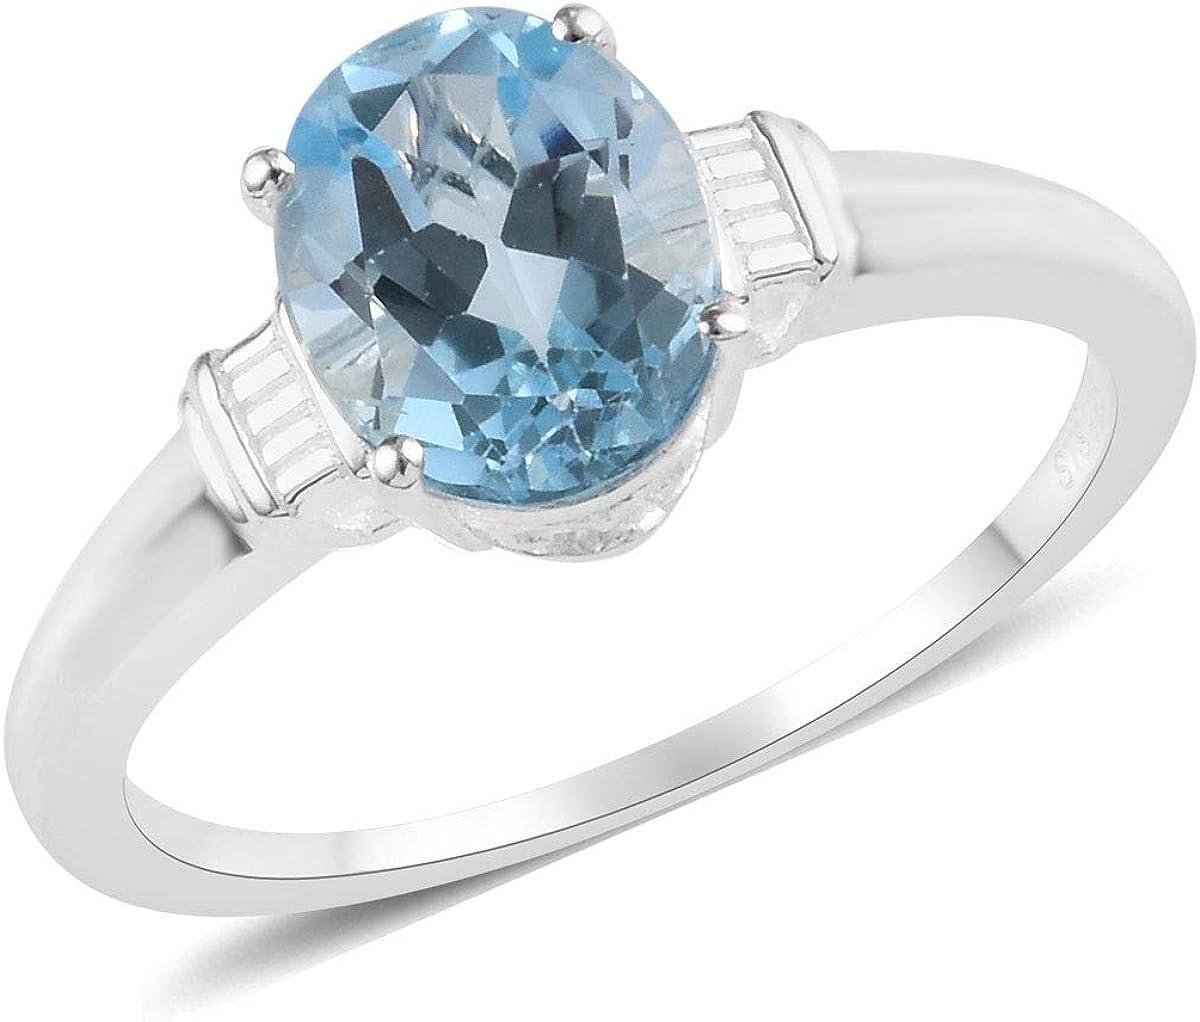 Women gift ring,Gemstone ring Engagement Ring Sky Blue topaz Ring 925 Sterling Silver ring